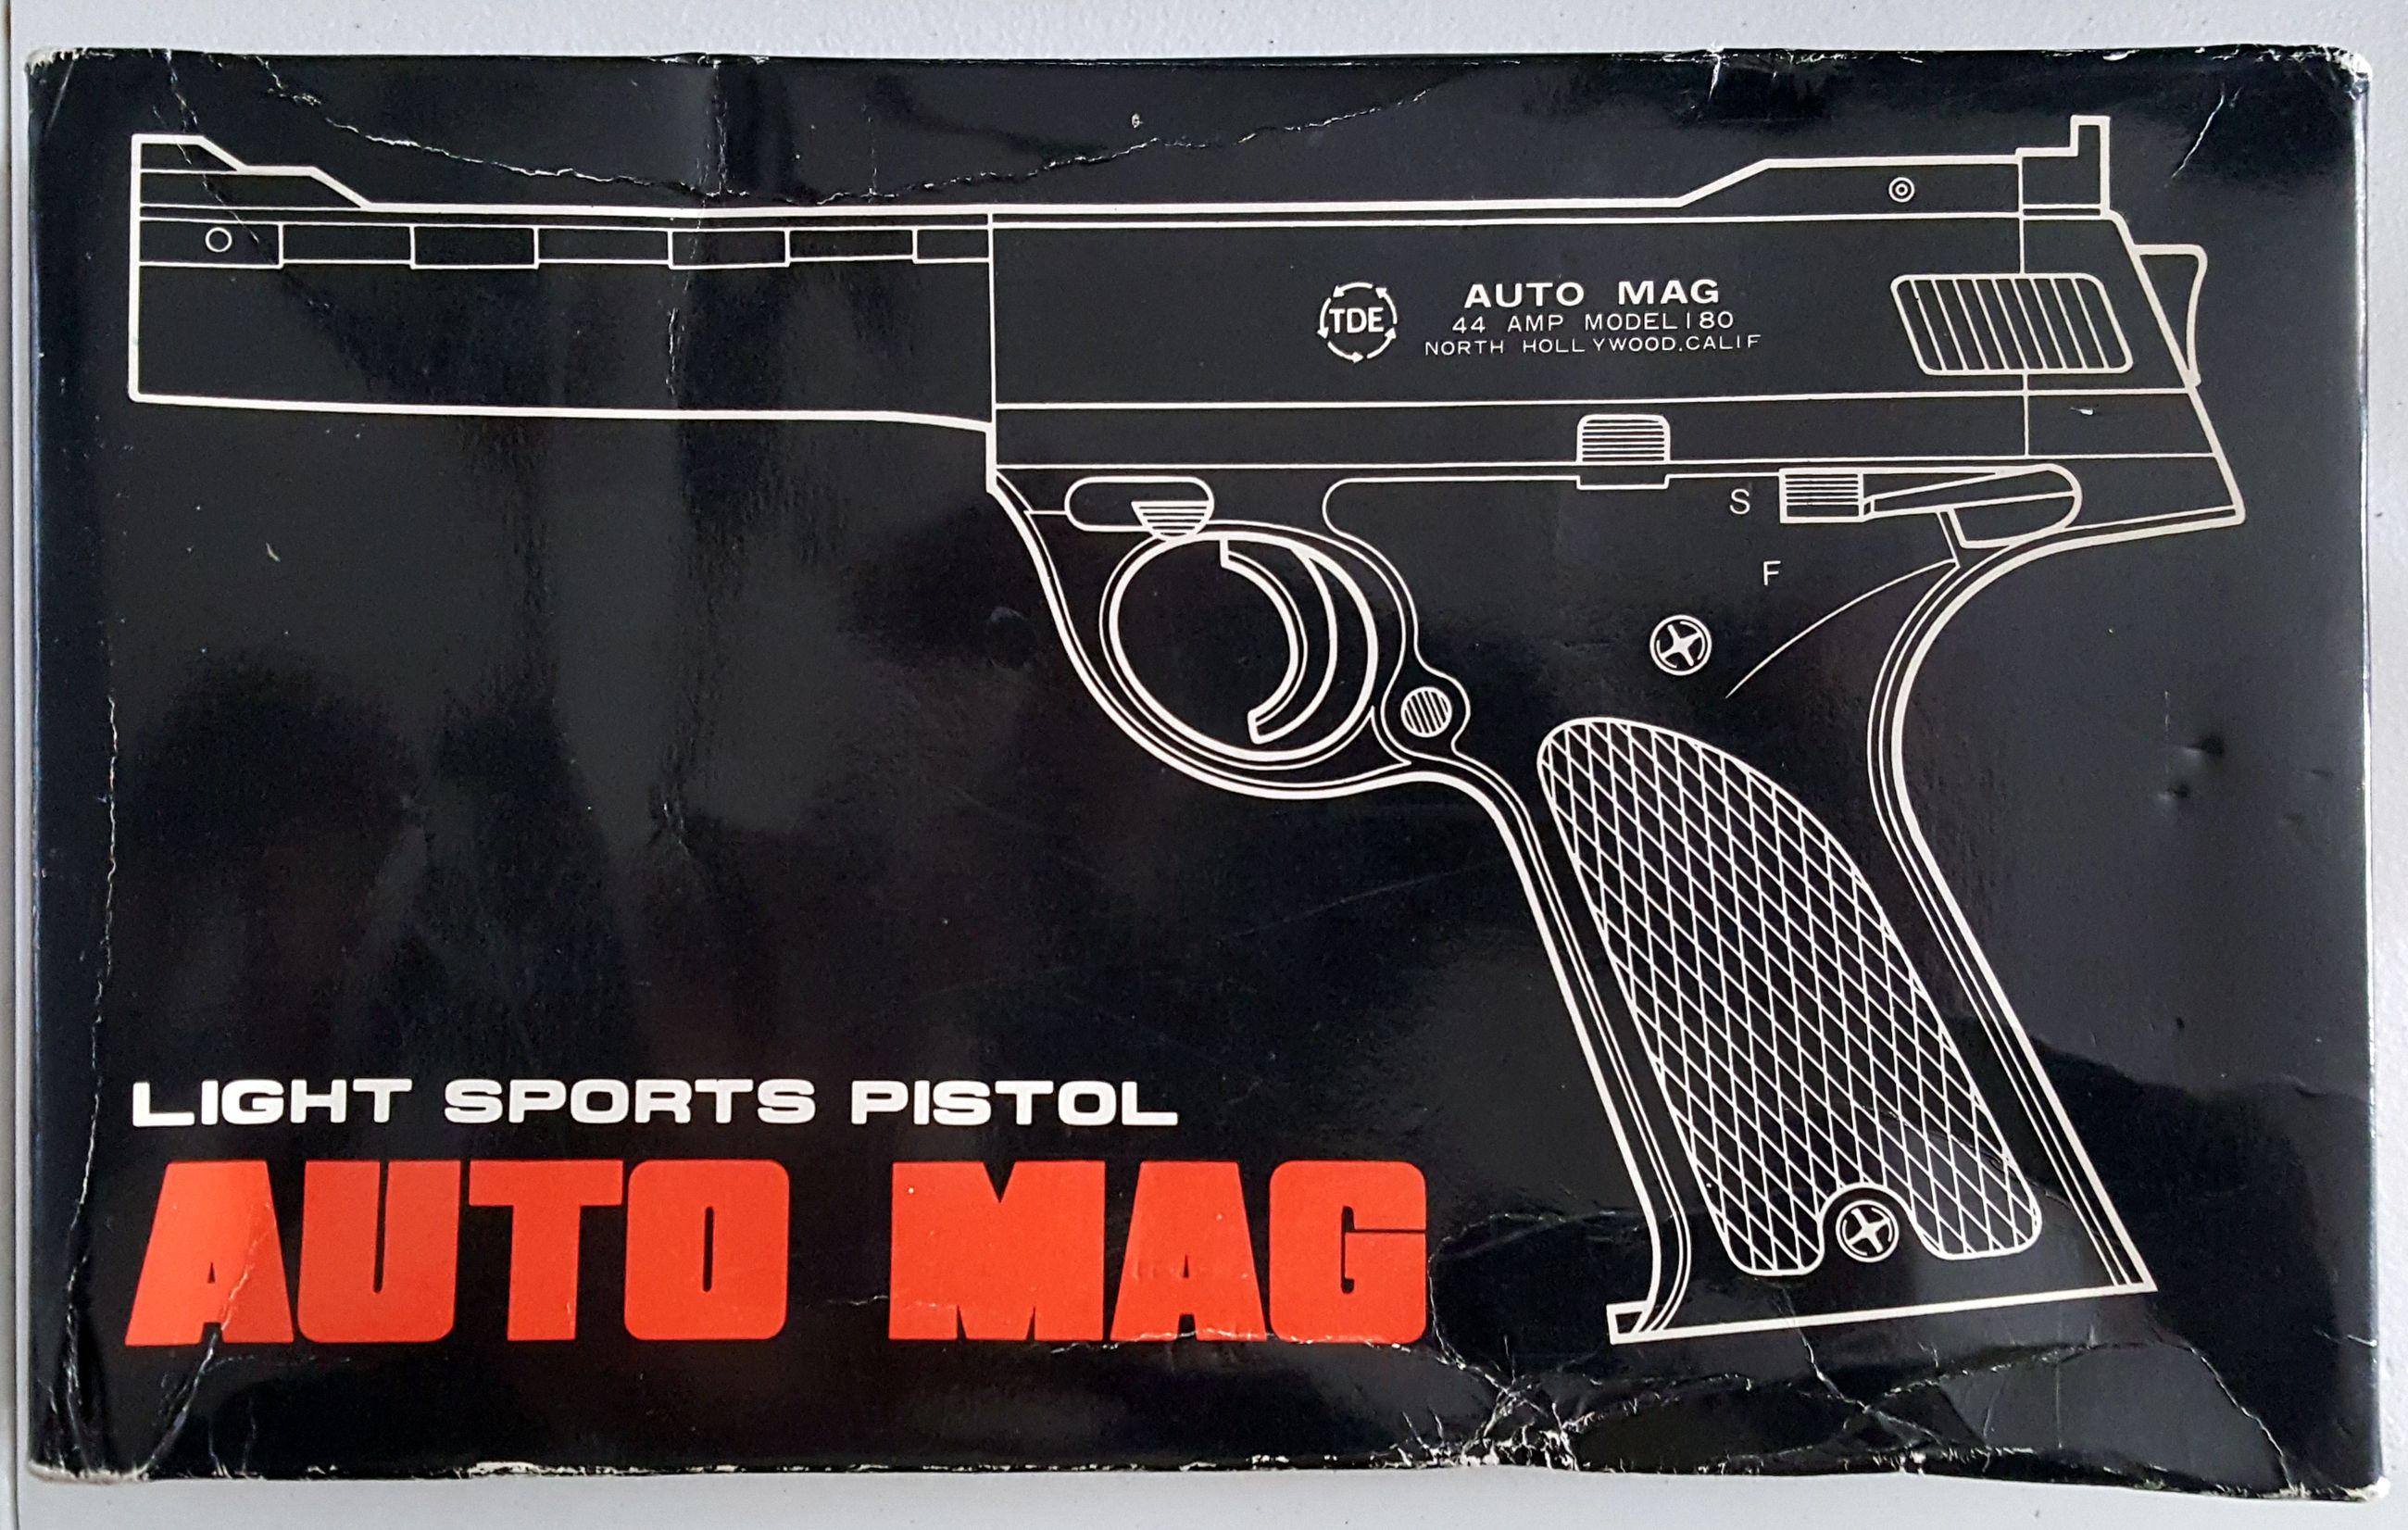 Autom Mag Box Top.jpg